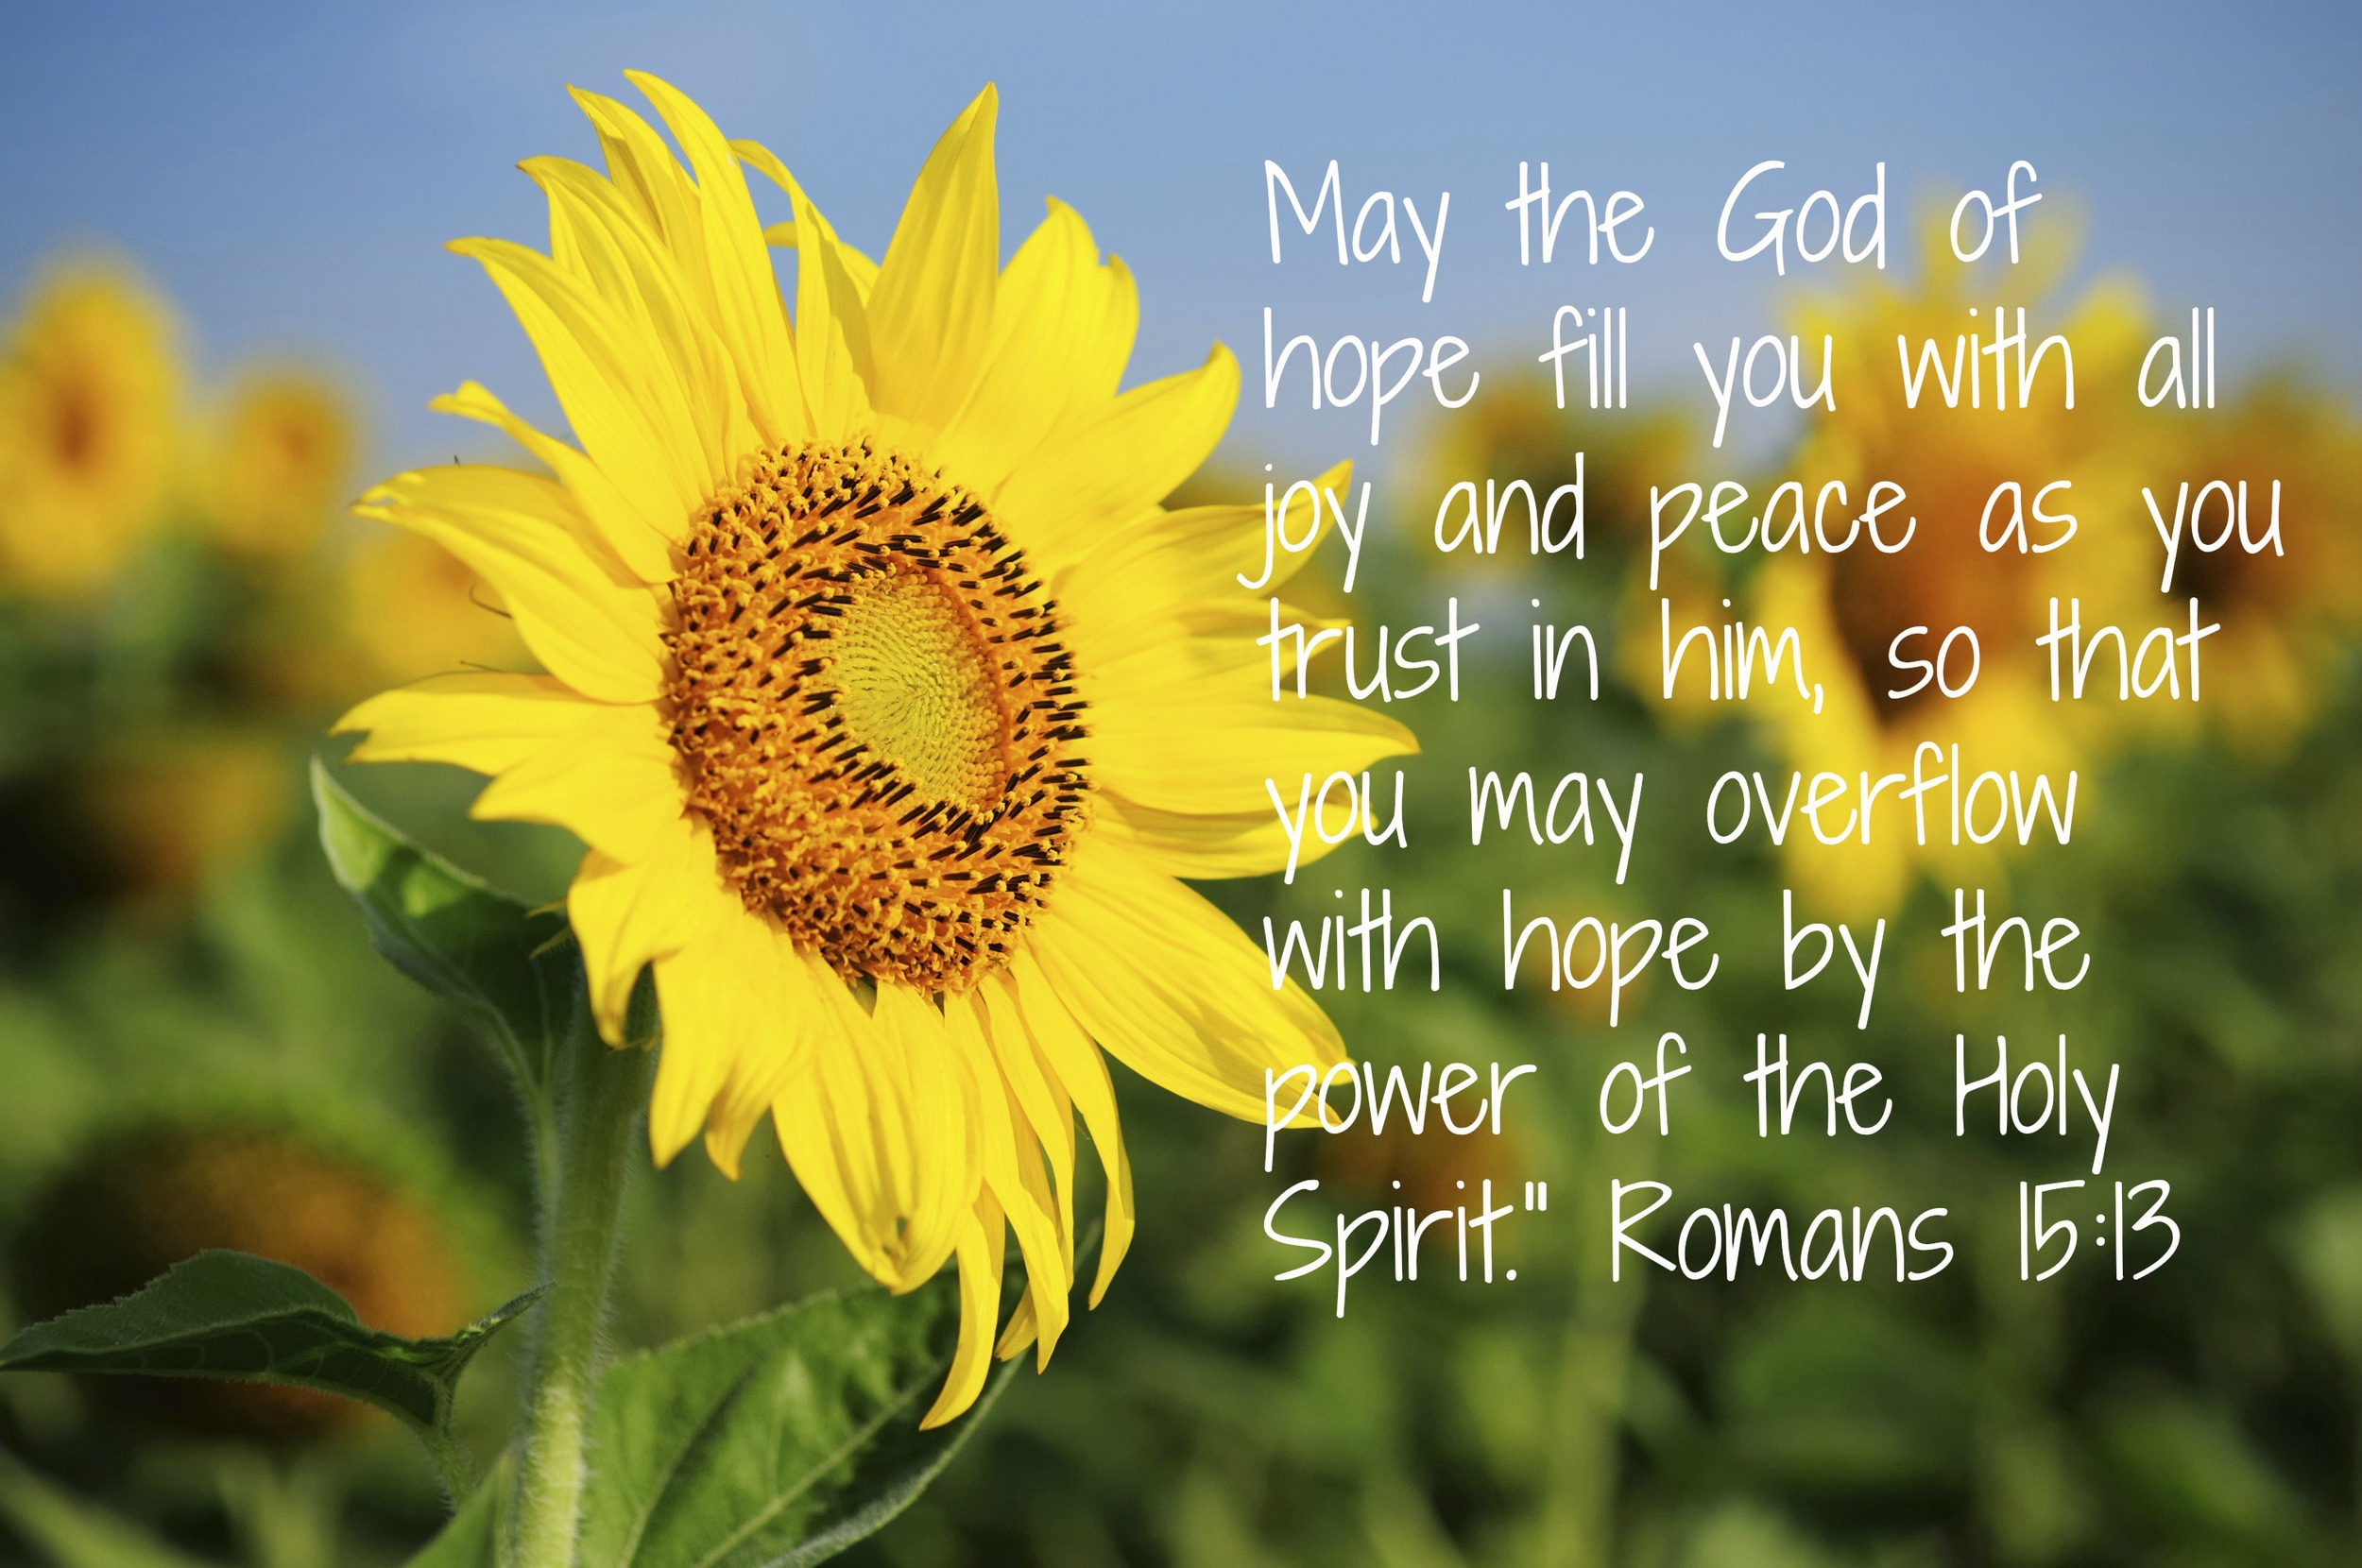 Romans 15 13.jpg